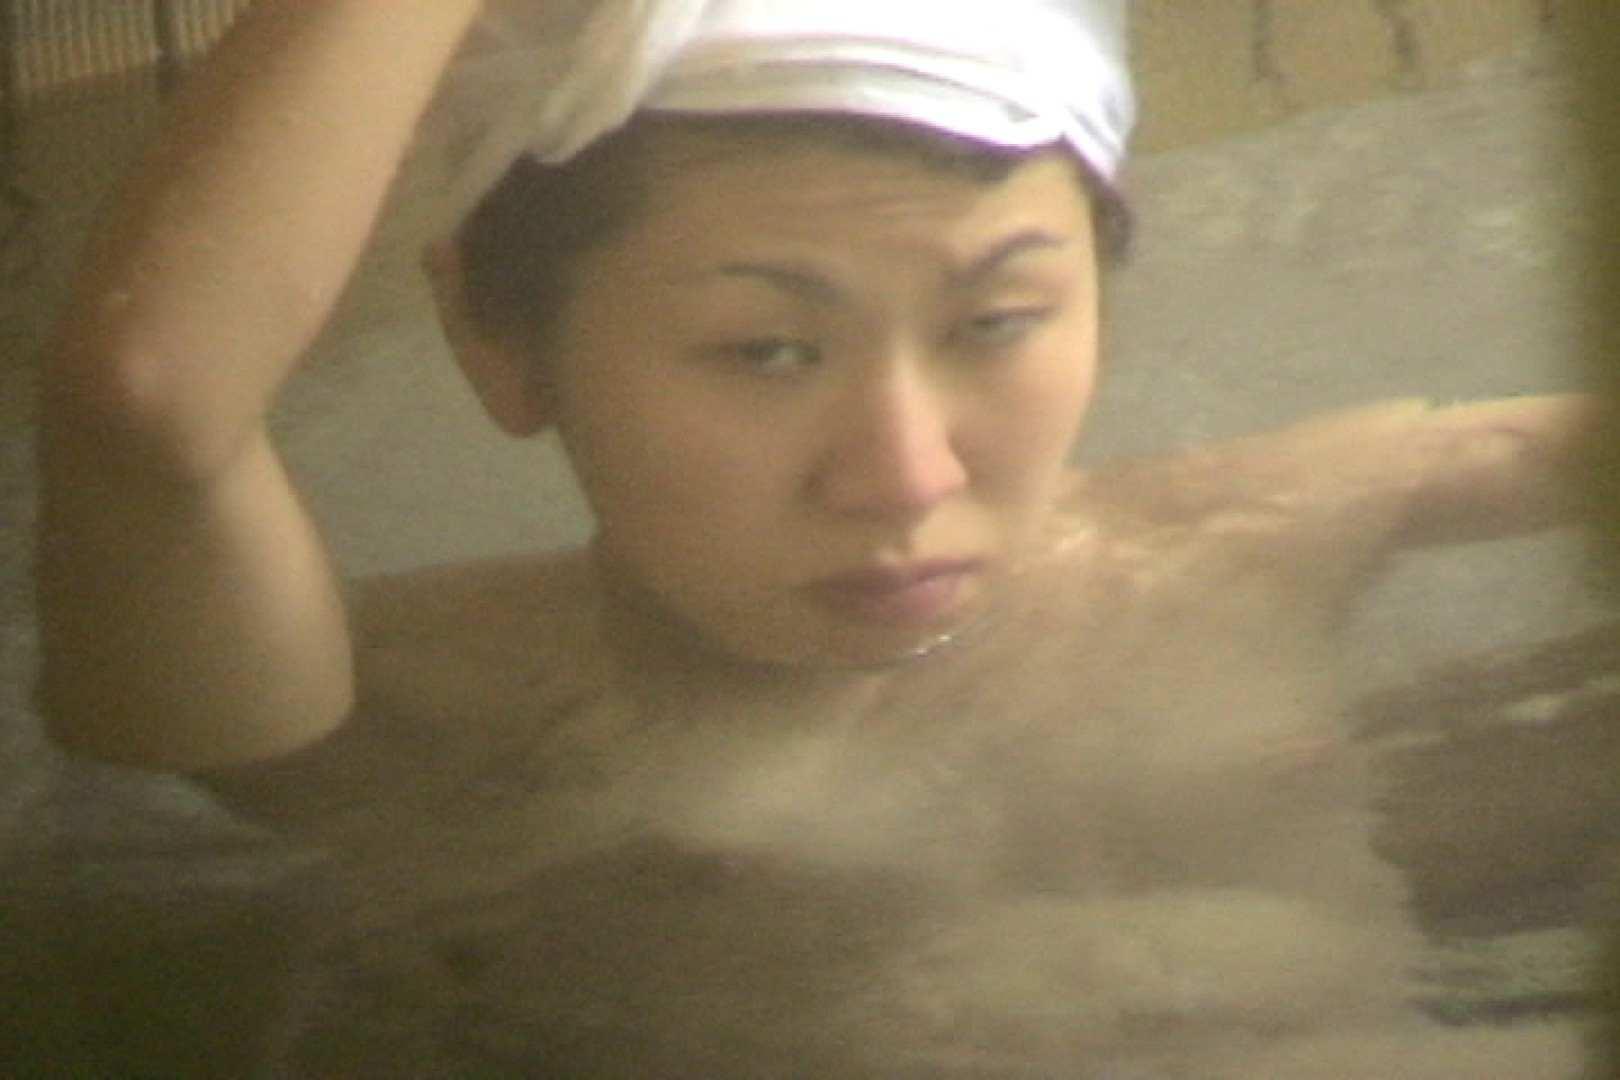 Aquaな露天風呂Vol.711 OLのエロ生活 AV無料 48連発 14